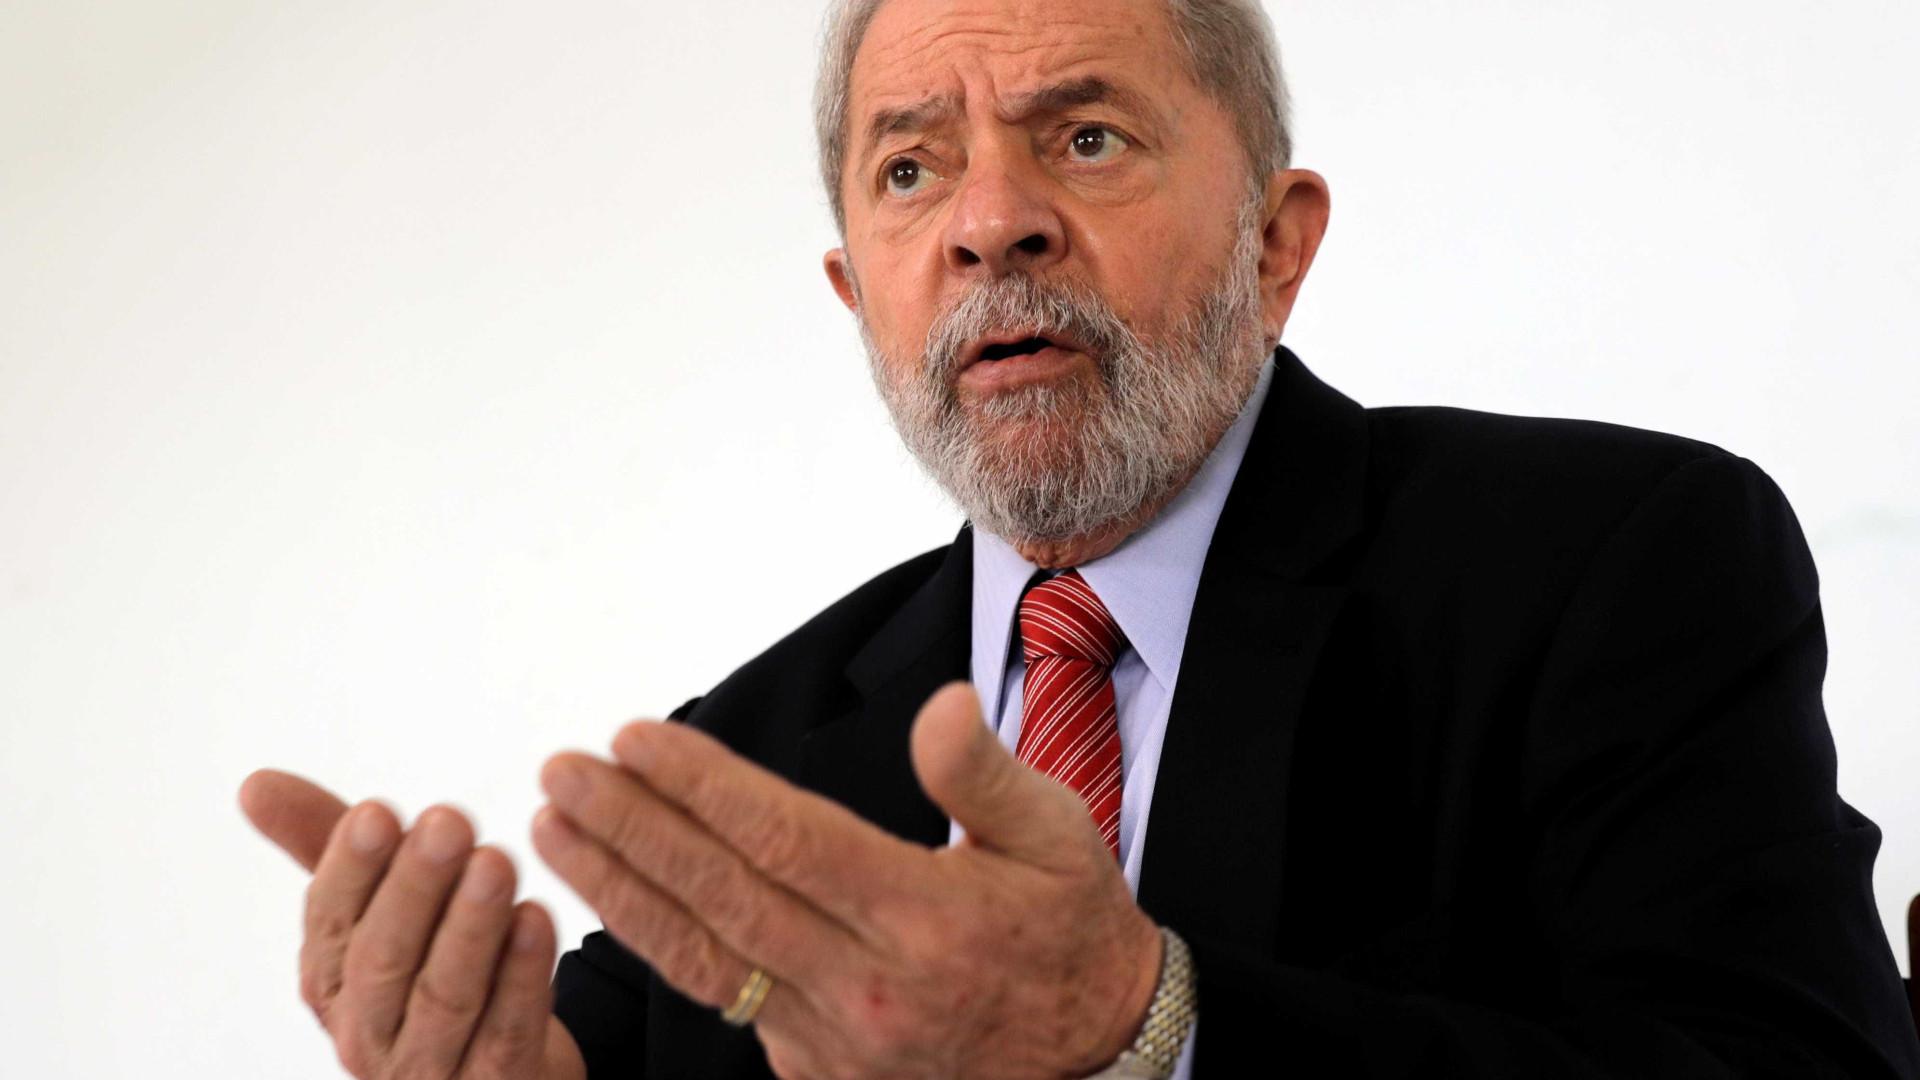 TCU vai investigar ato de Lula que liberou verba para obra irregular